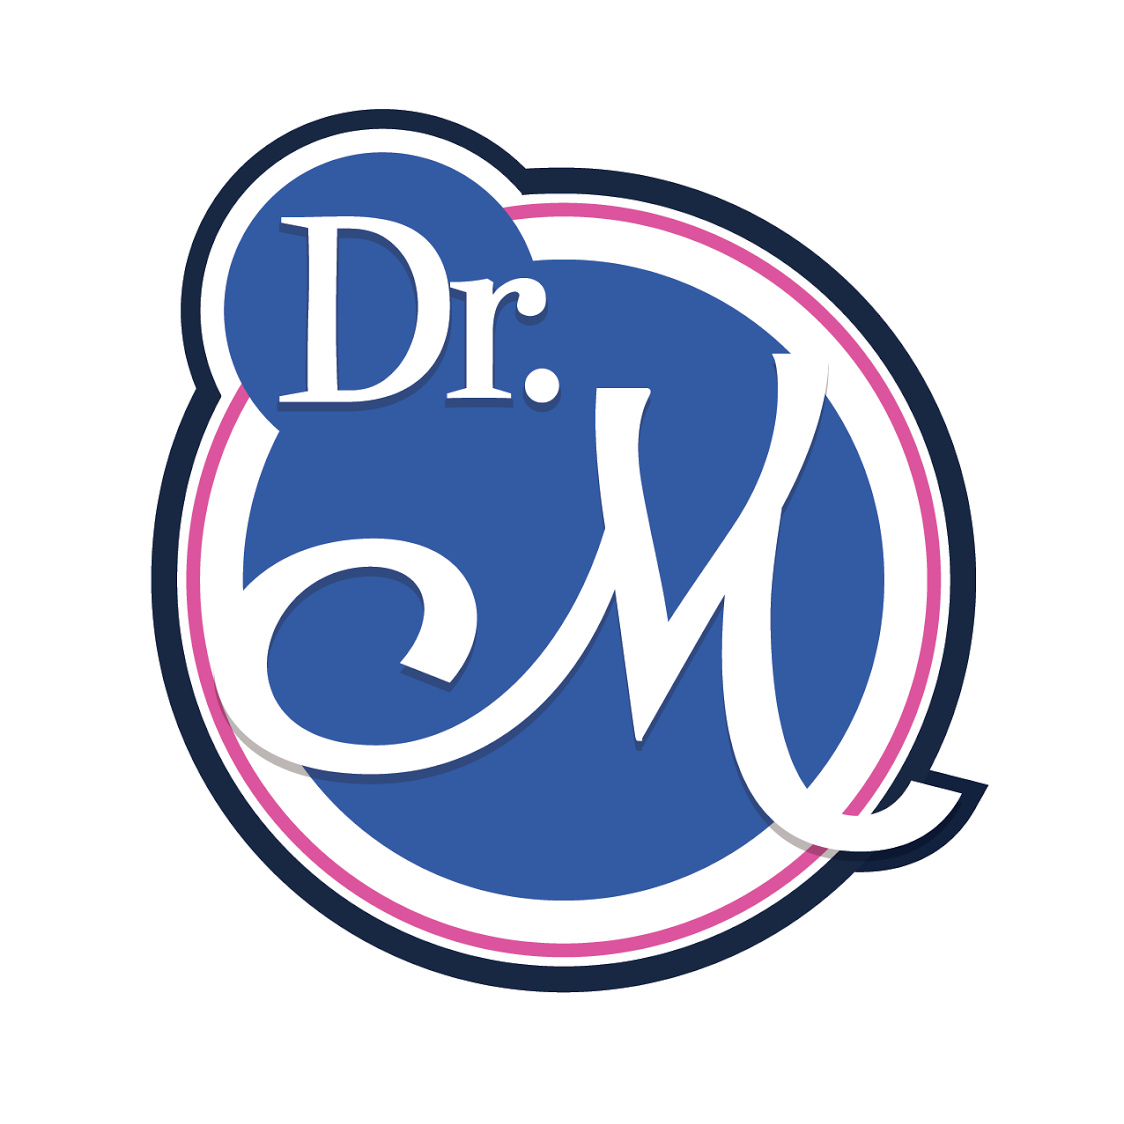 Dr. Chelsea Mason Dental image 1